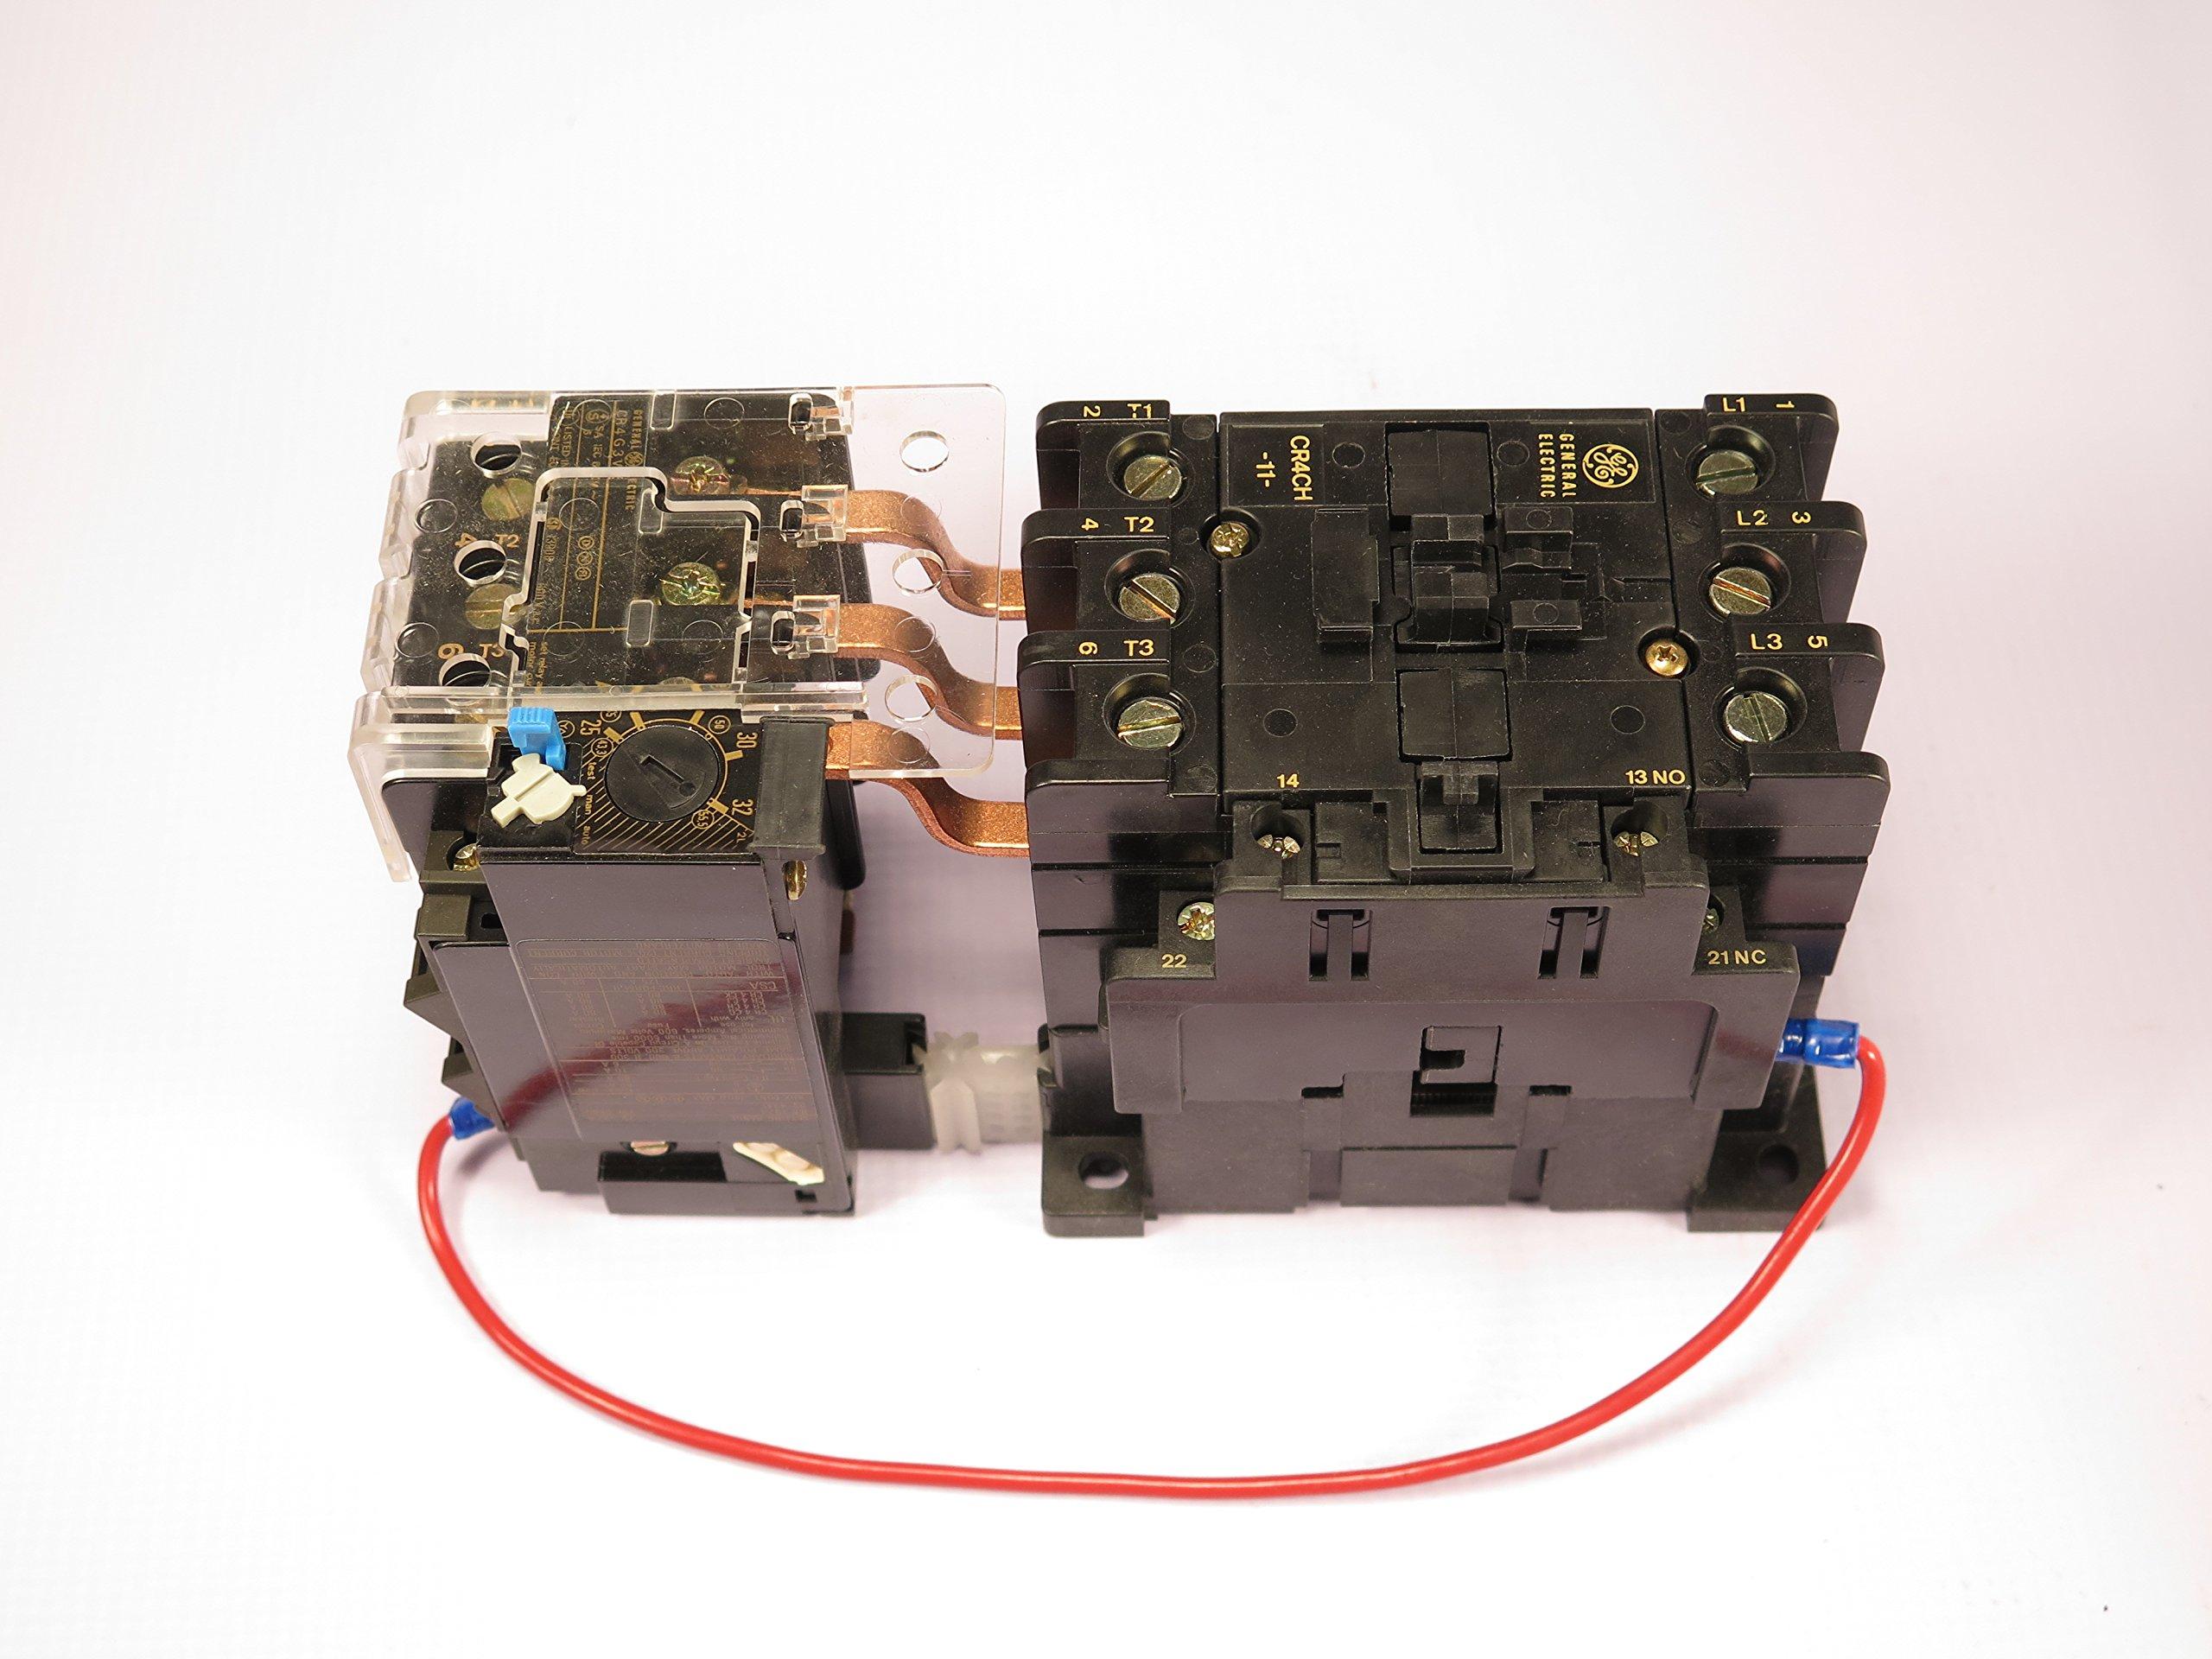 CR4CHH/CR4G3WS GE MAGNETIC MOTOR STARTER OVERLOAD ADJUSTABLE 25-32AMP 24V AC COIL by Sprecher & Schuh (Image #1)